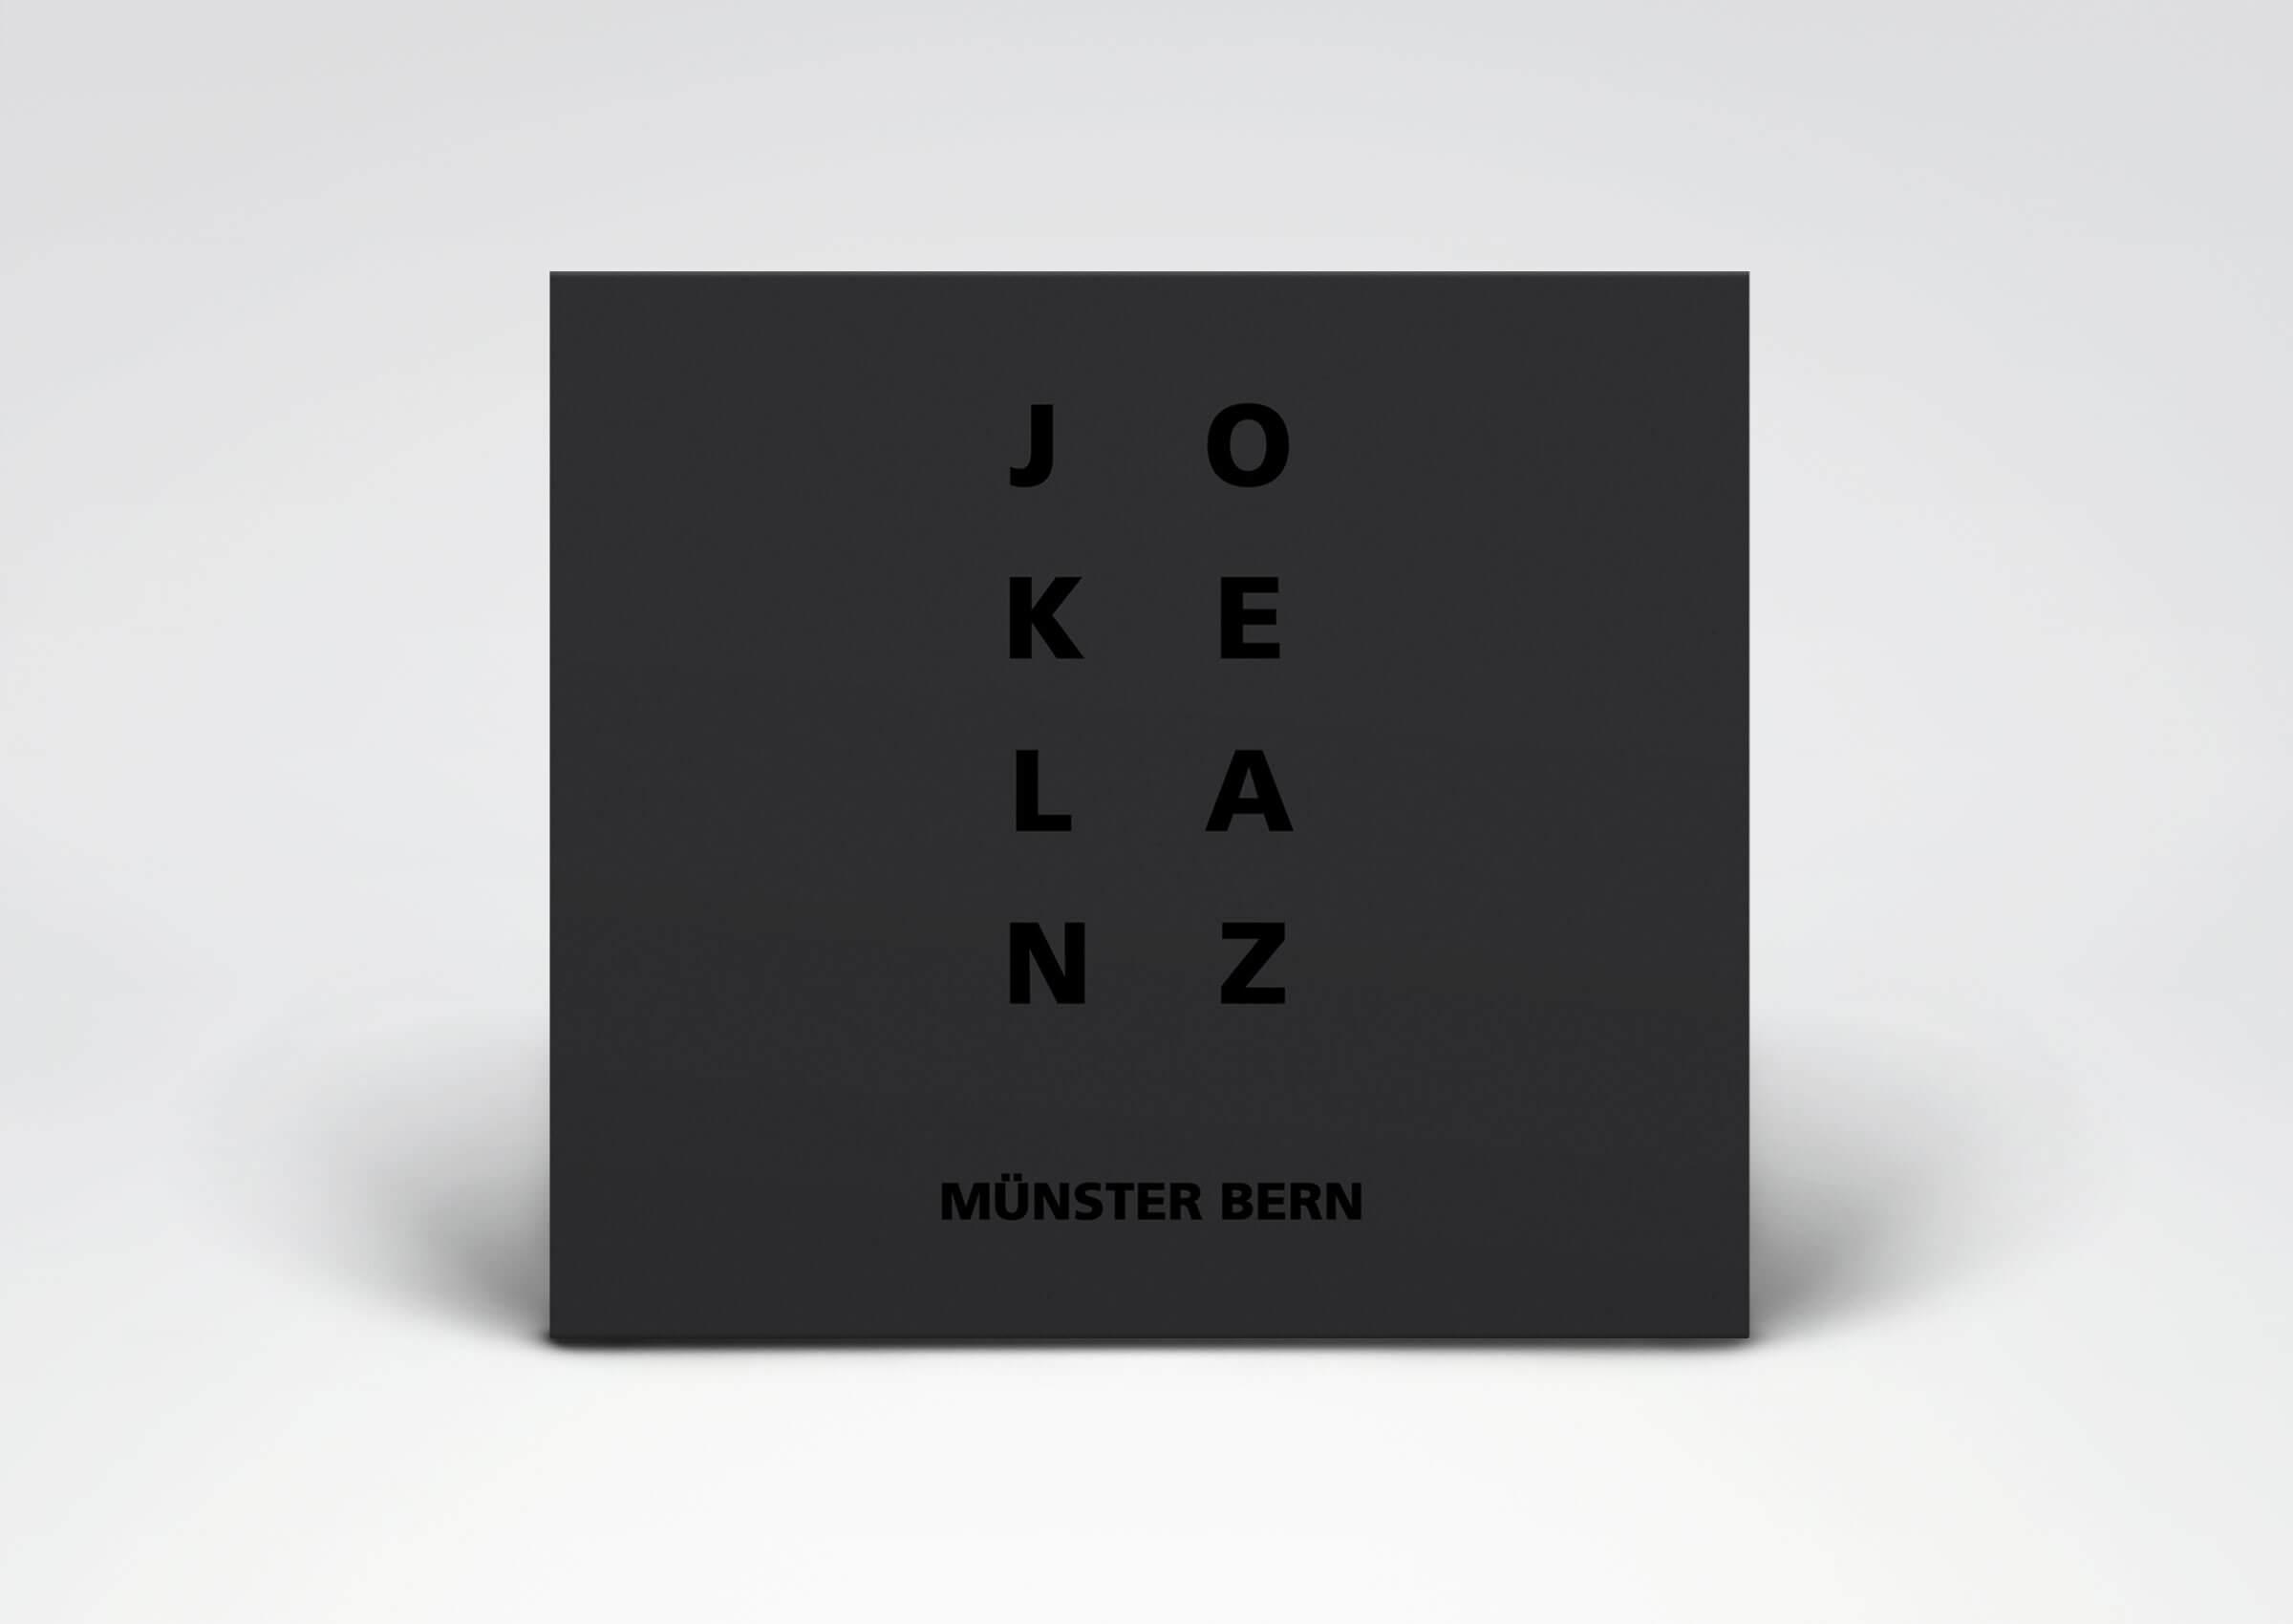 Cubus Berlin cubus records joke lanz